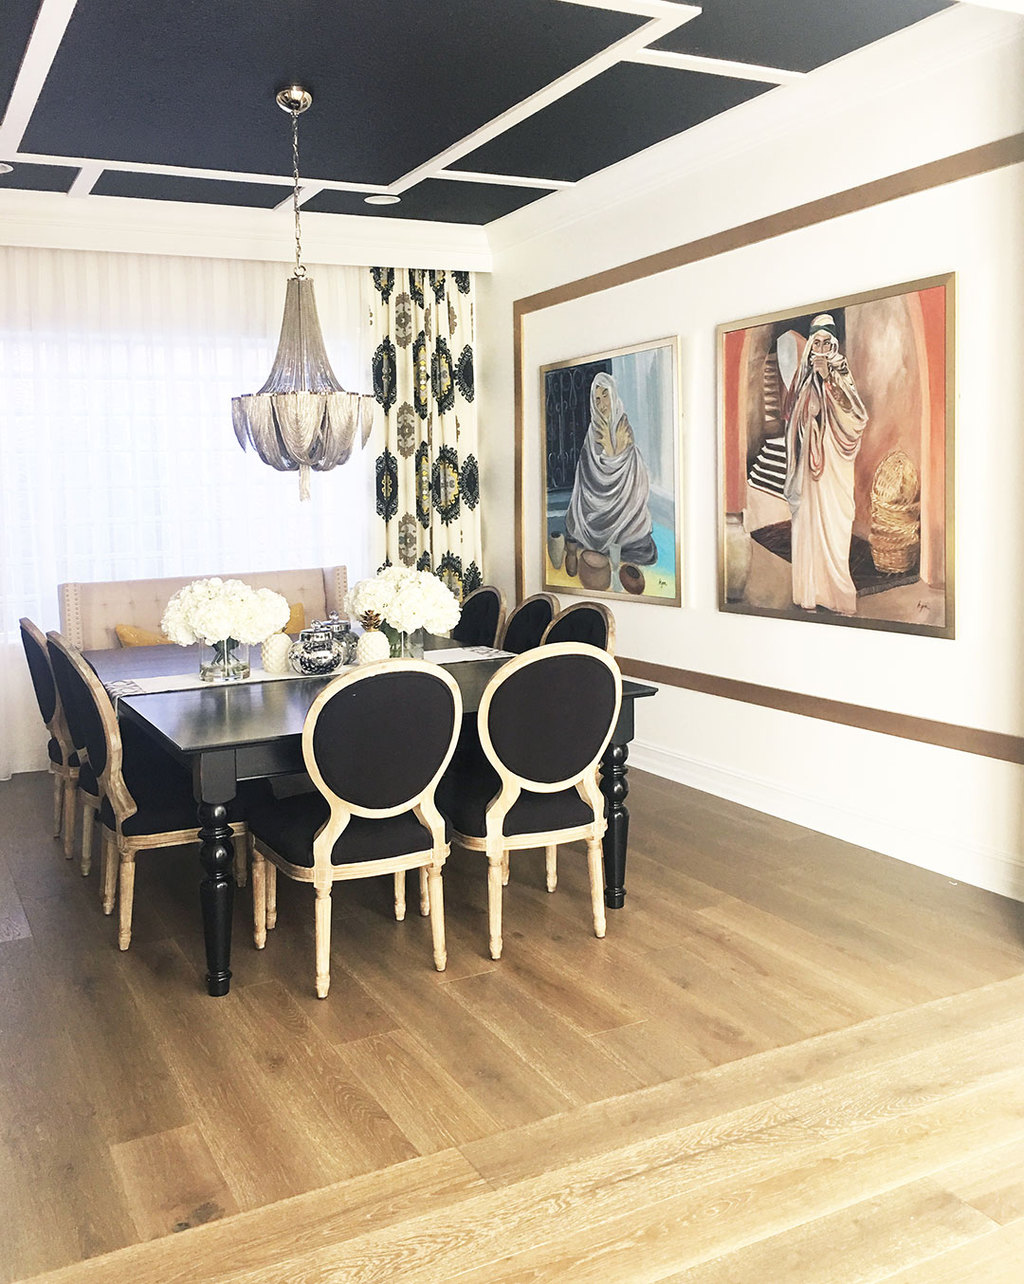 dining-room-black-ceiling-chandelier